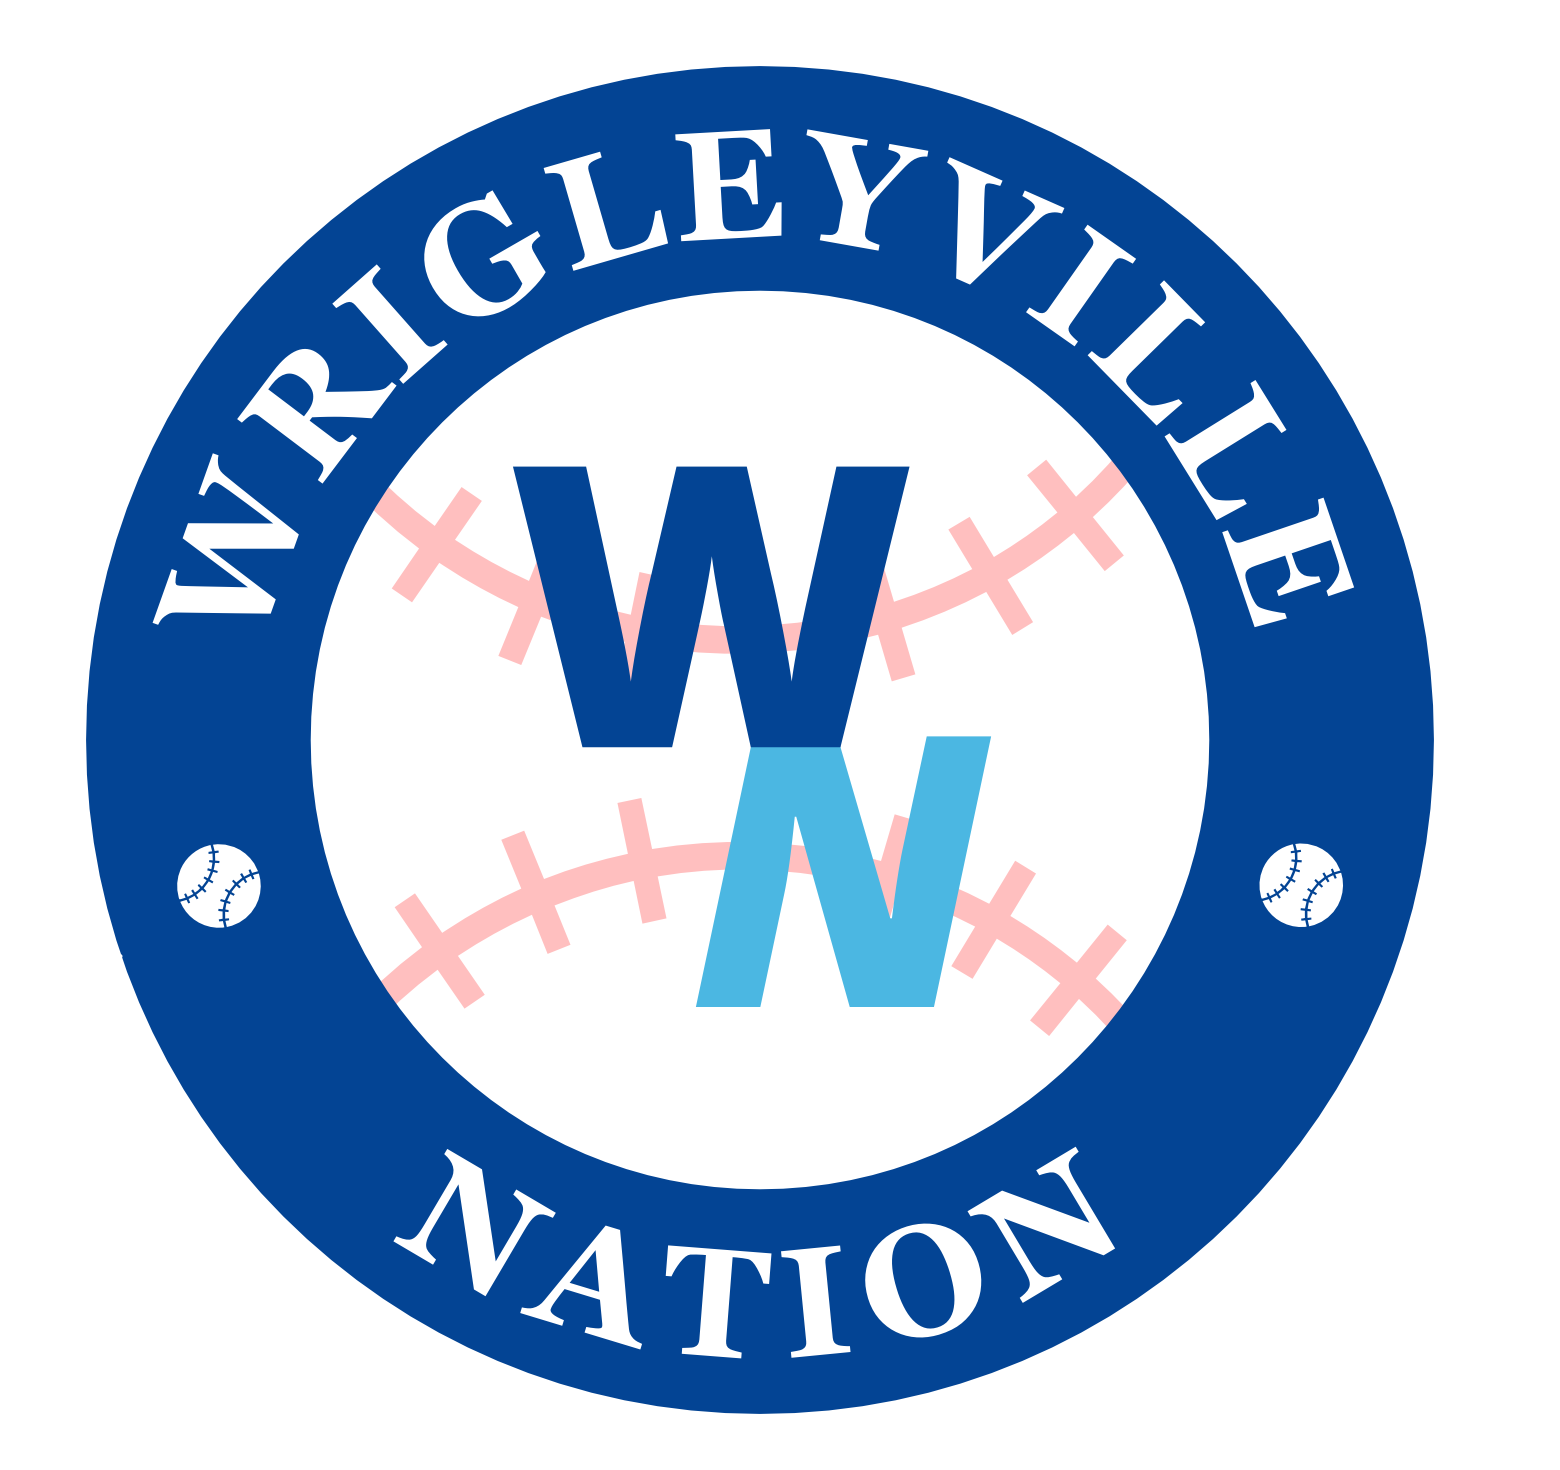 Artwork for Wrigleyville Nation Ep 233 - Guest: Matthew Trueblood, Mills No Hitter, Kimbrel, Cubs Upcoming Schedule